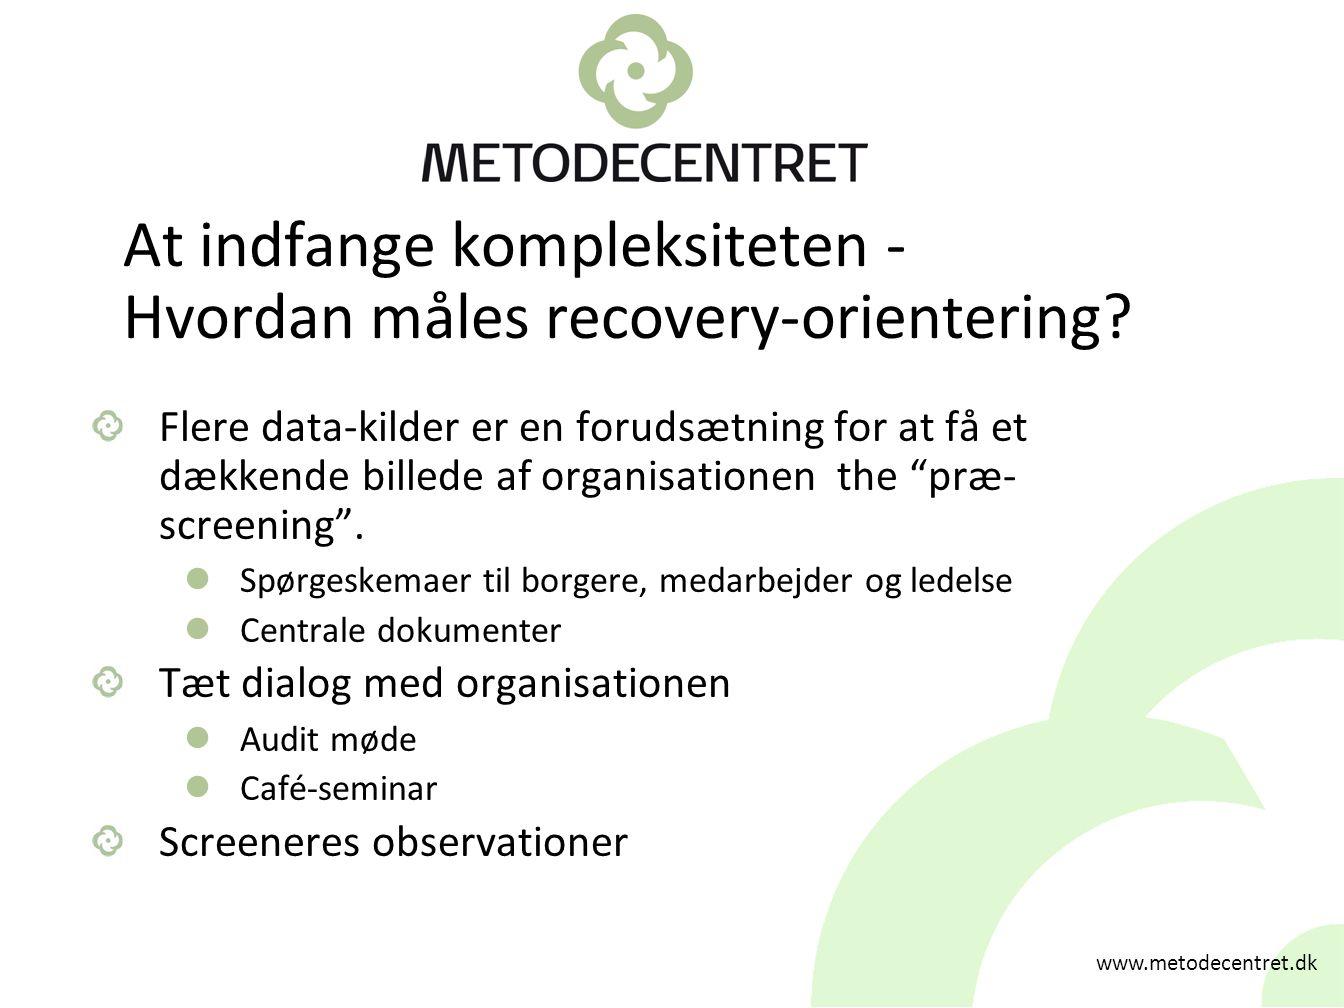 At indfange kompleksiteten - Hvordan måles recovery-orientering